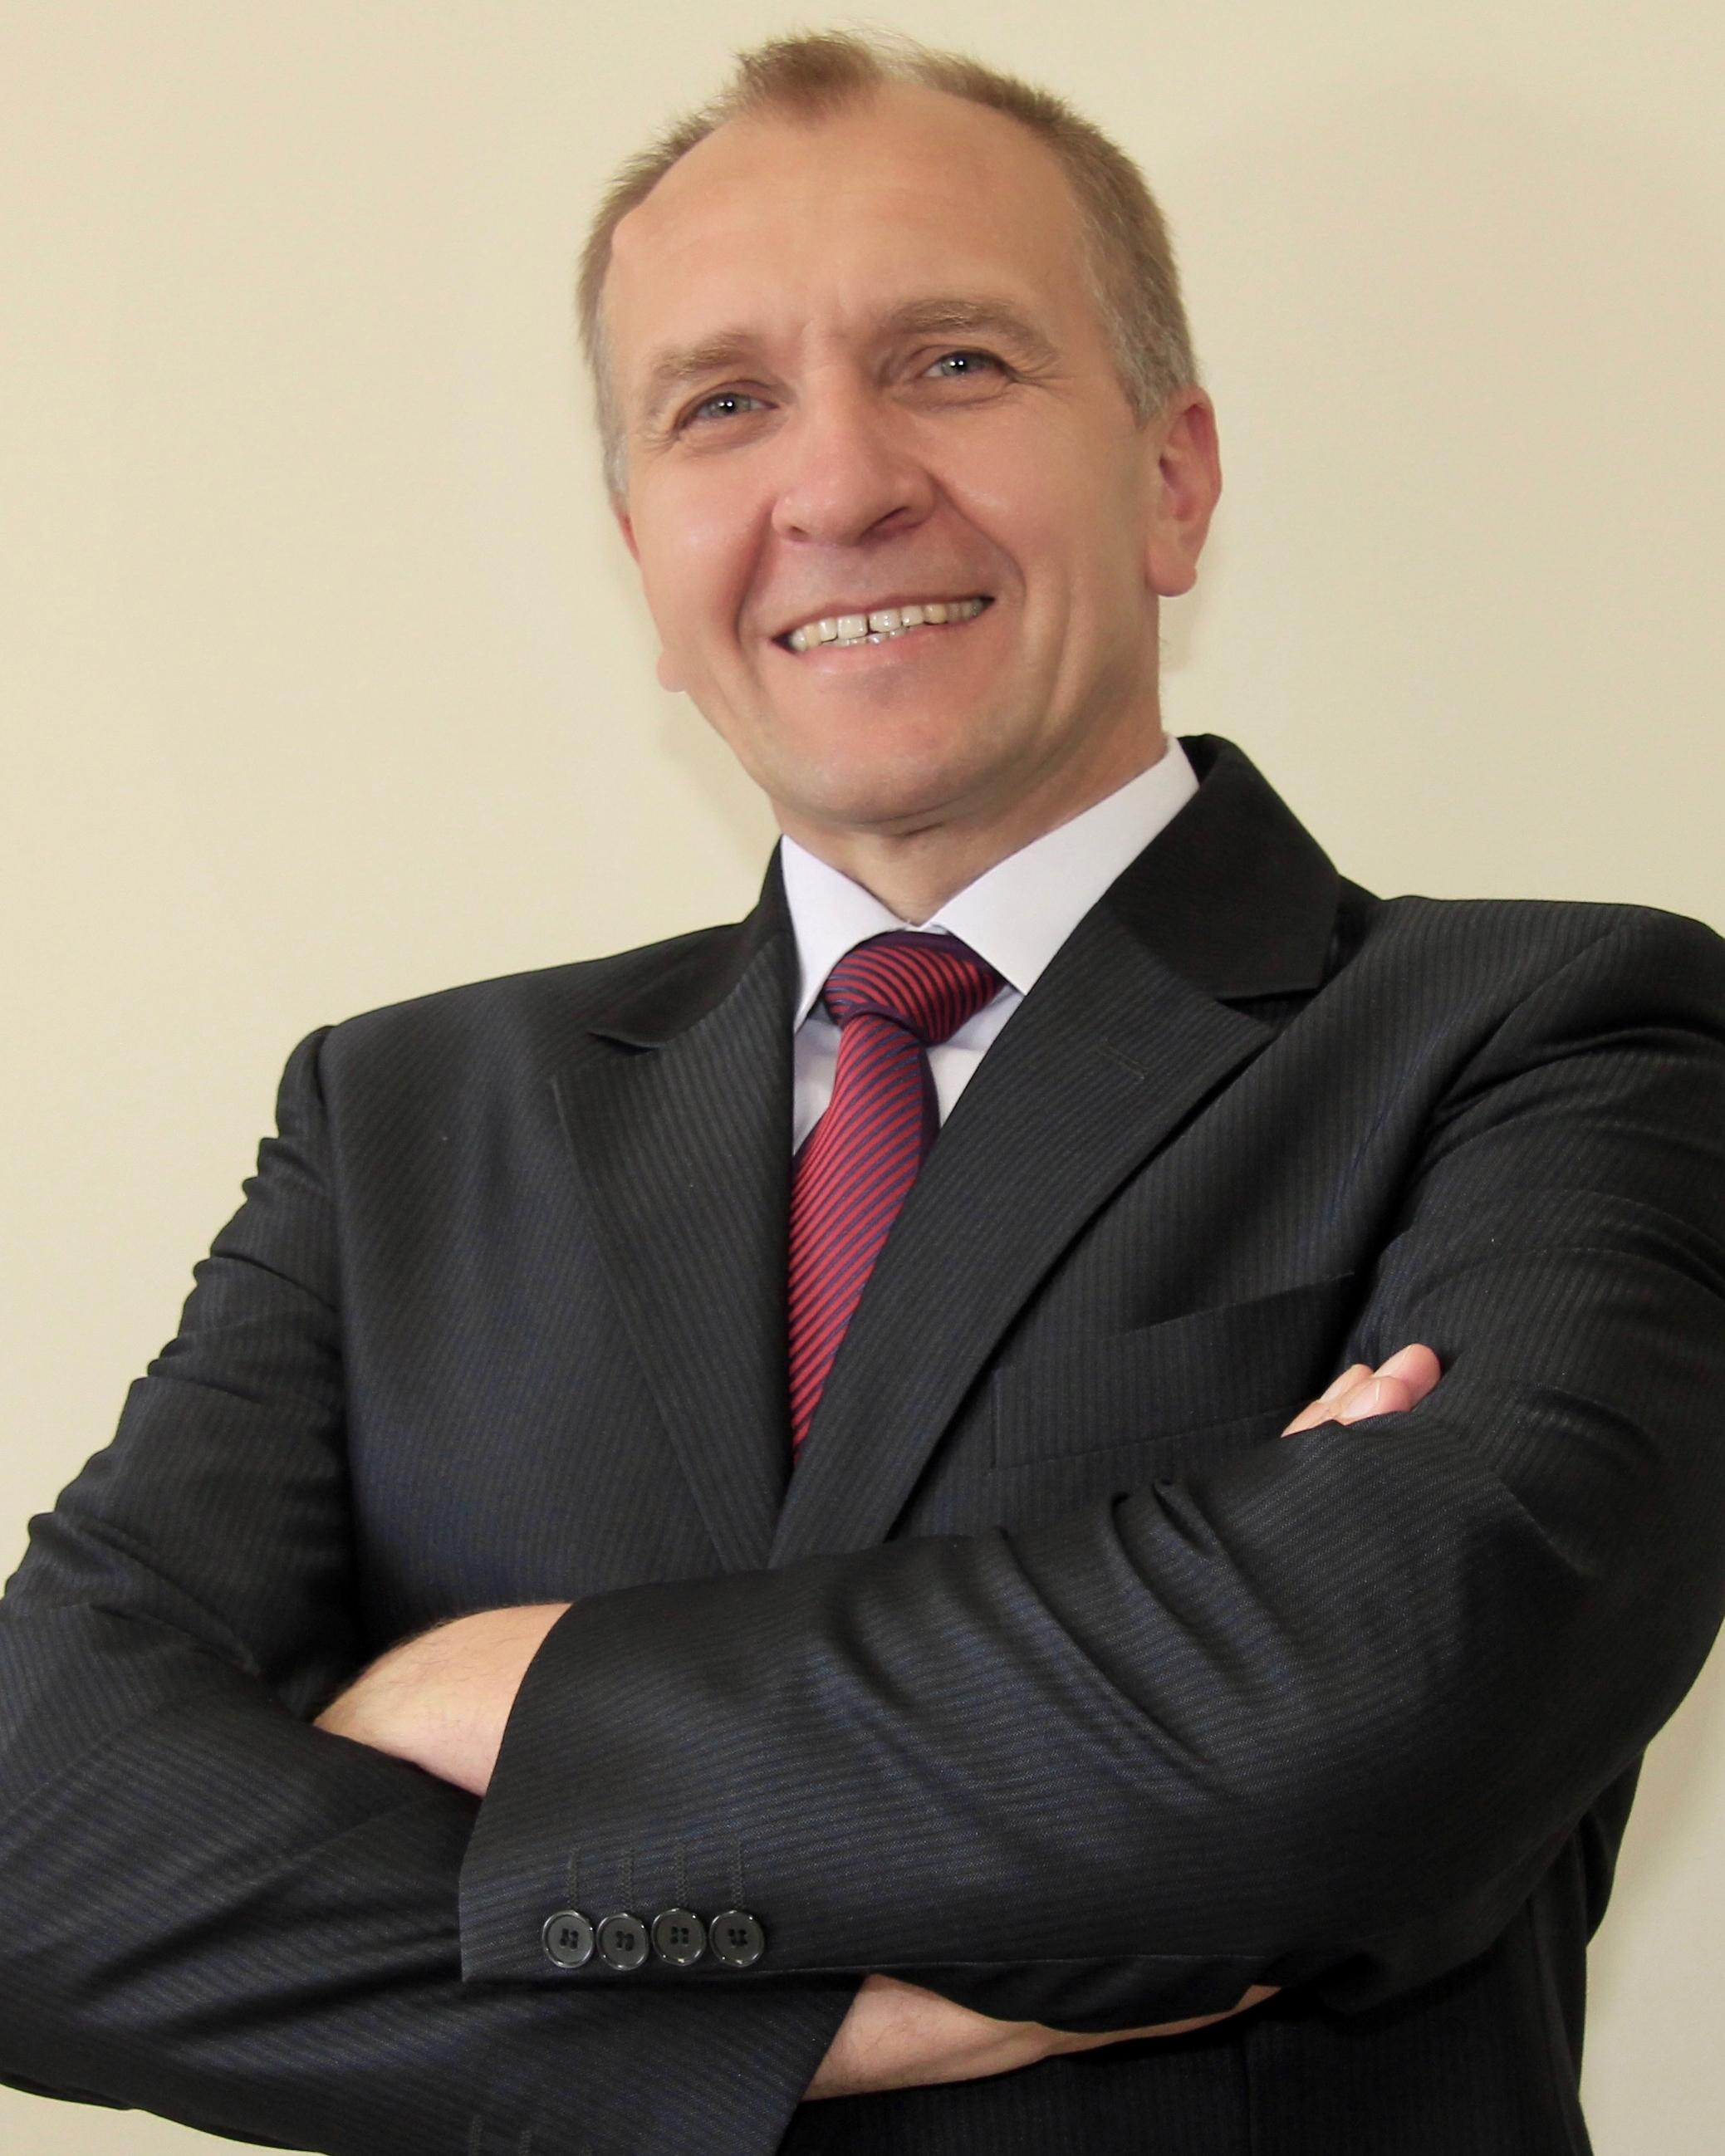 Remigijus Jančauskas